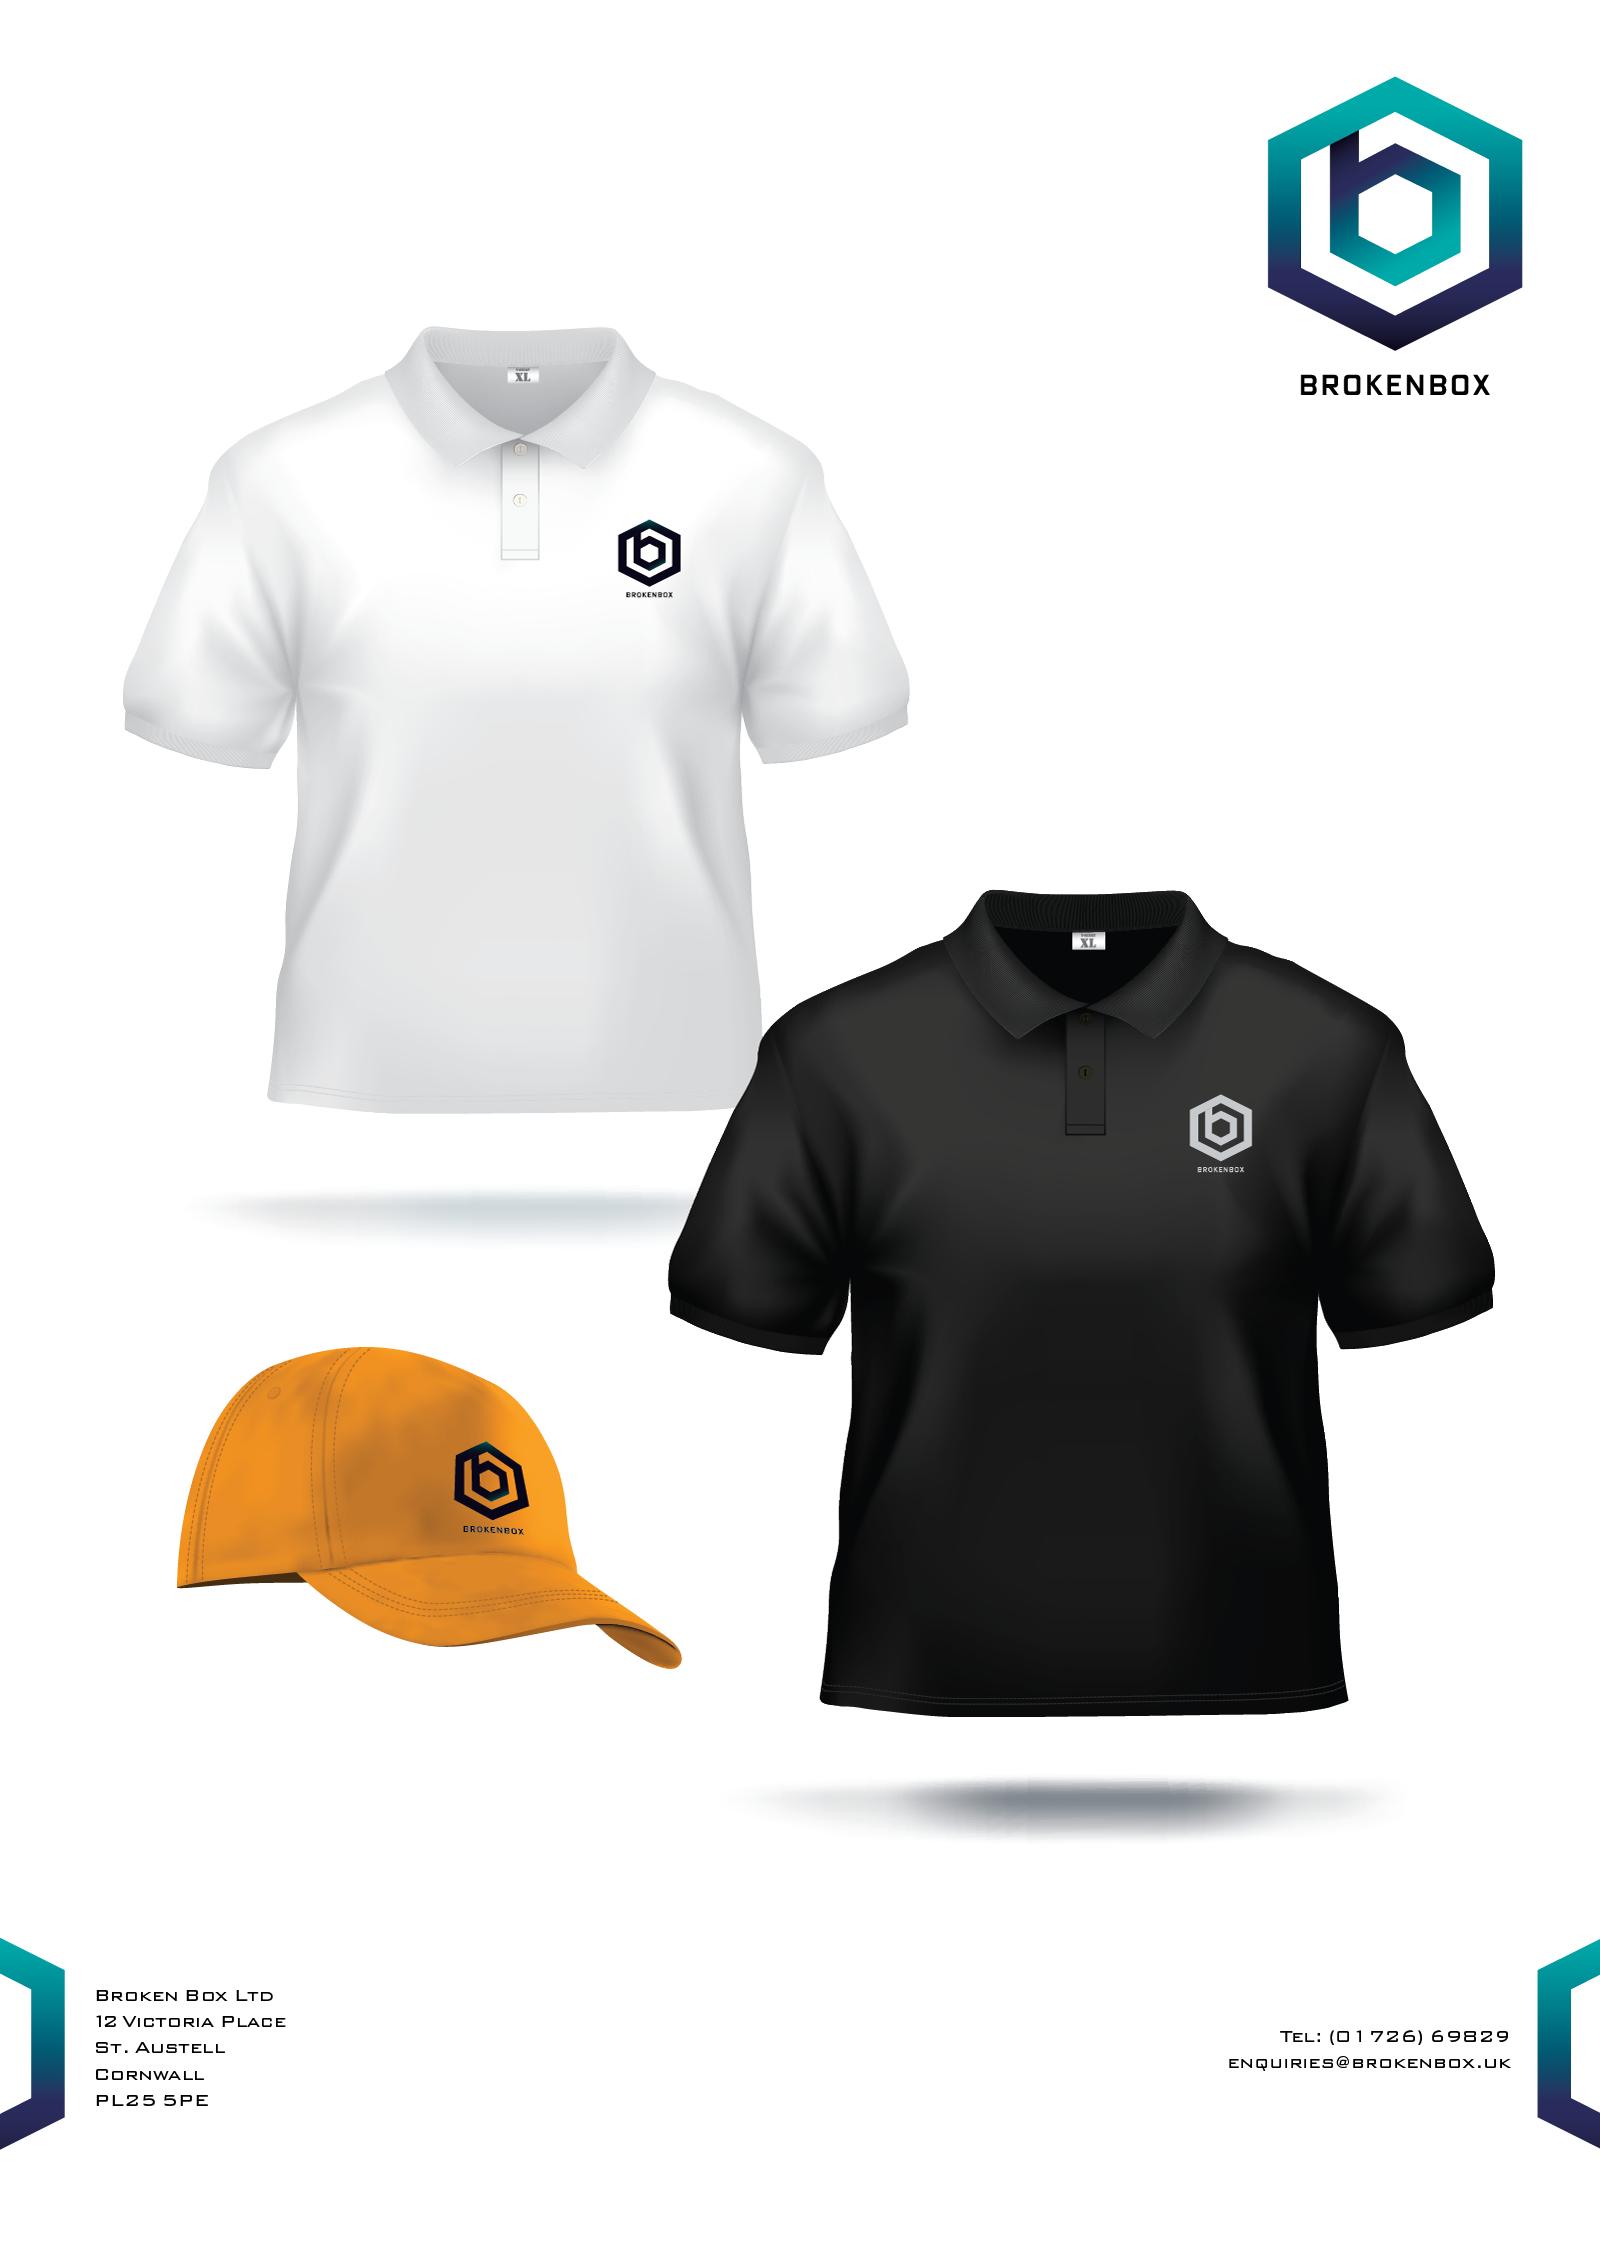 brokenbox_branding_clothing_tshirts_cap